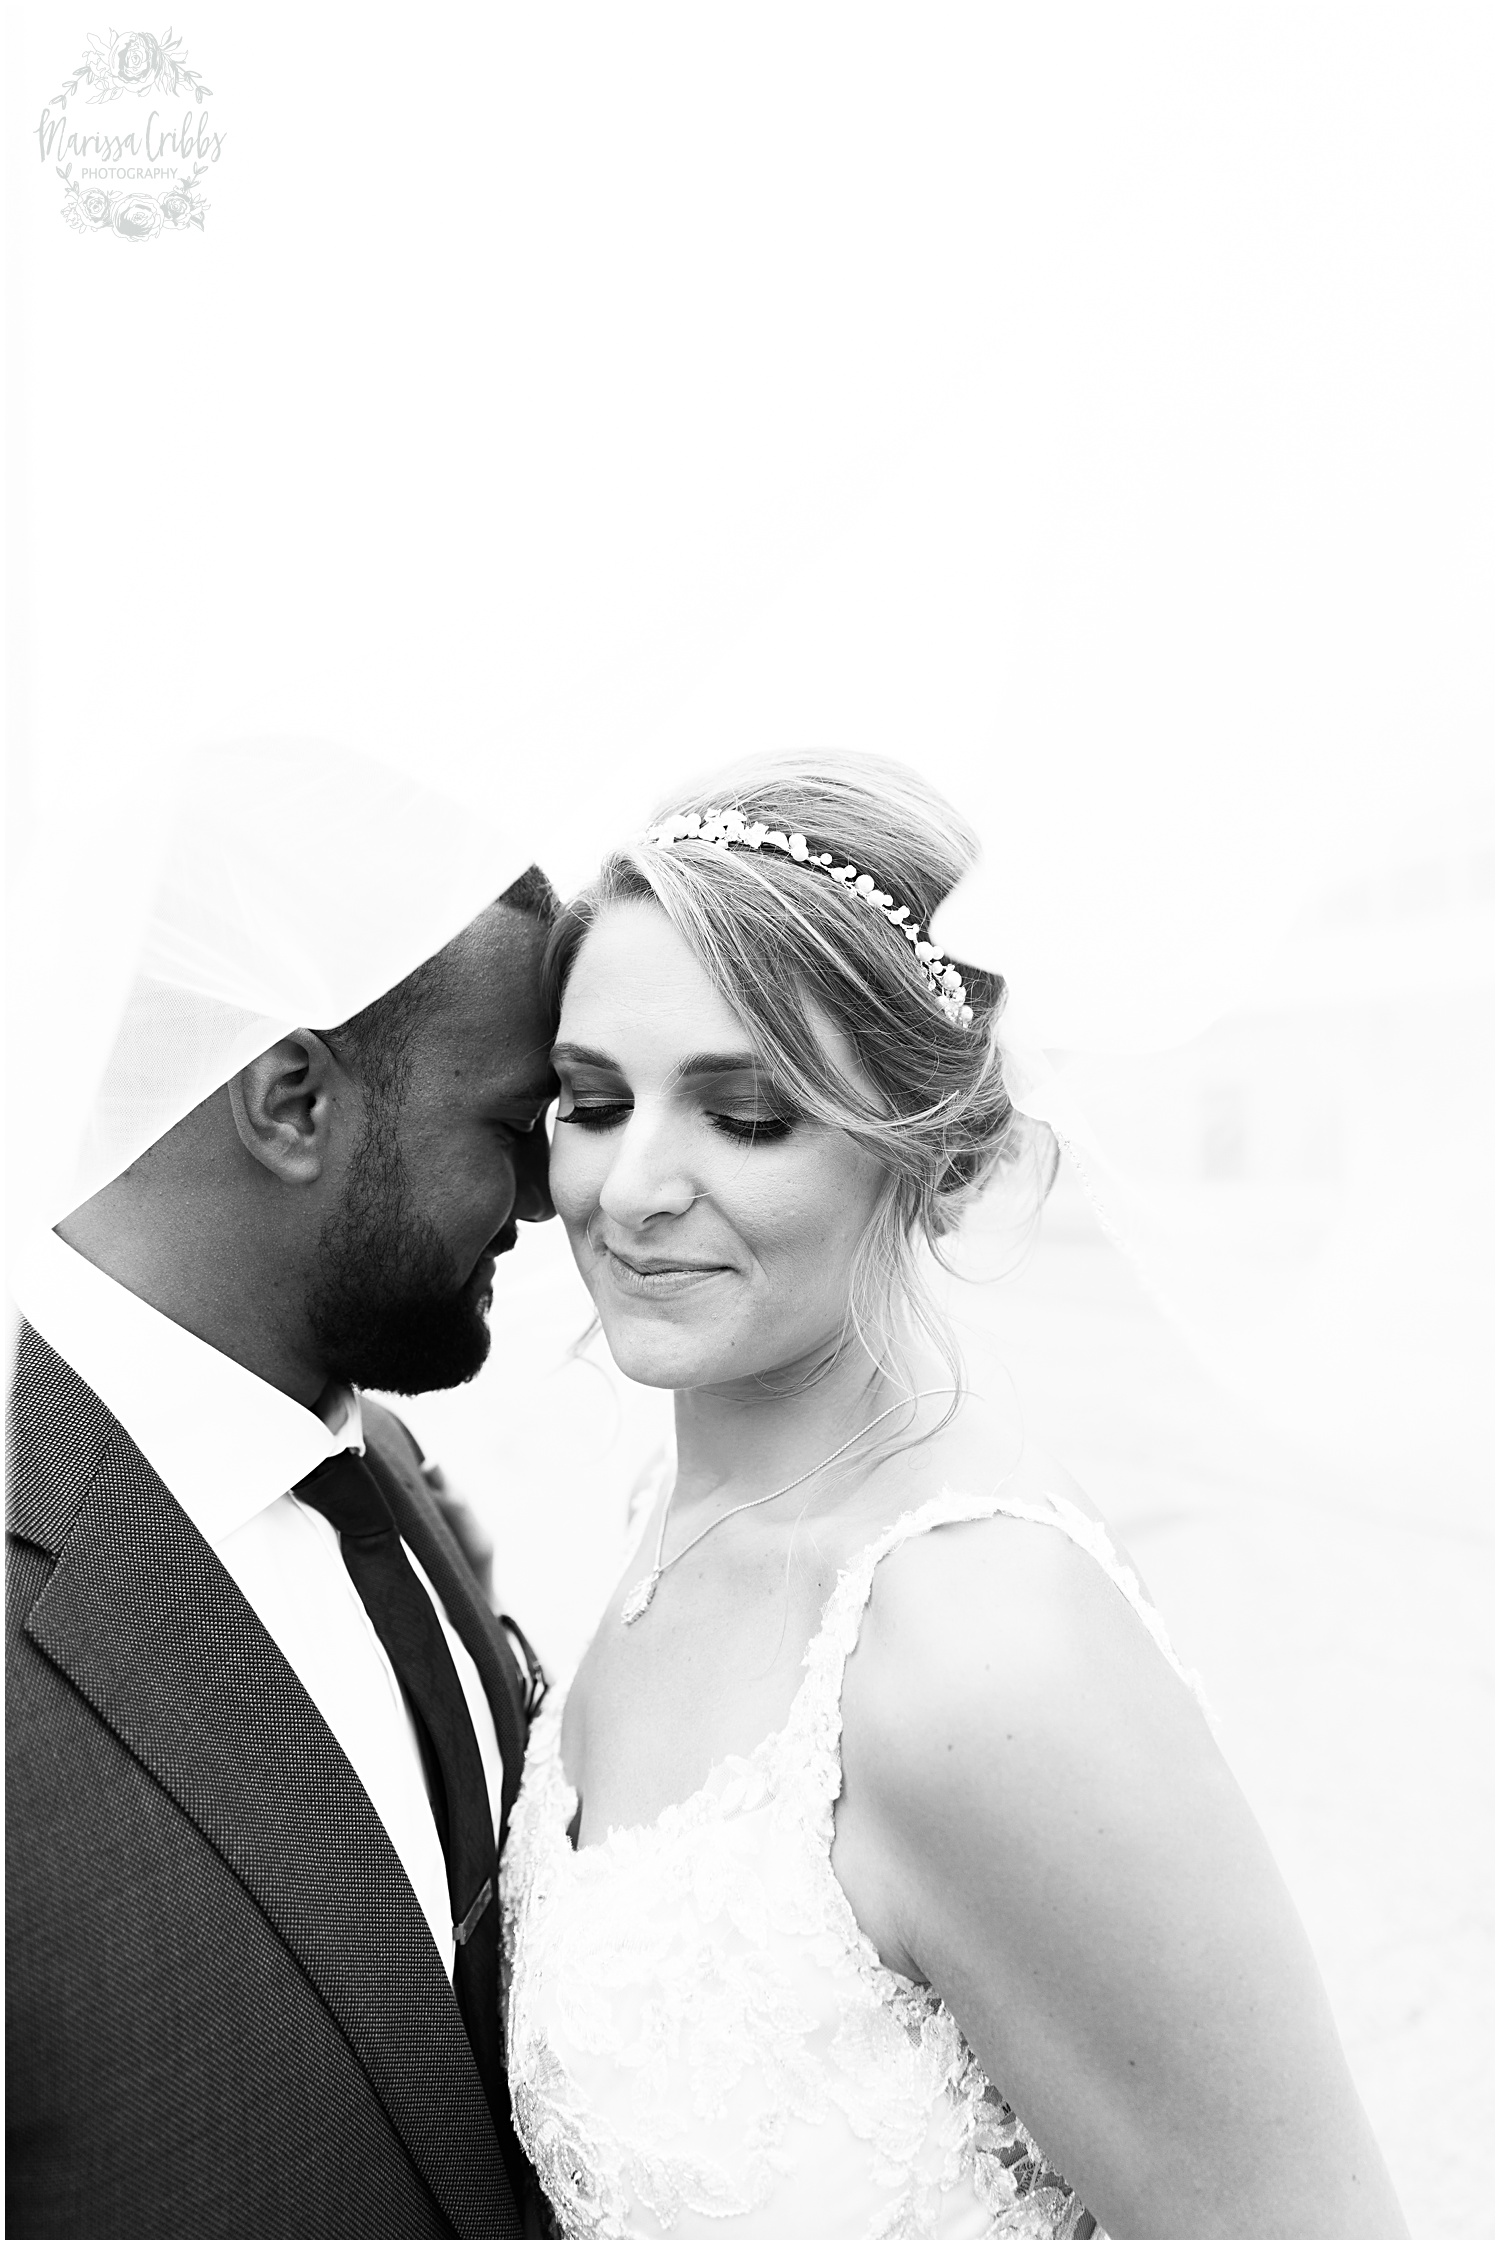 BAUER WEDDING   KELSEA & JUSTIN   MARISSA CRIBBS PHOTOGRAPHY_6545.jpg